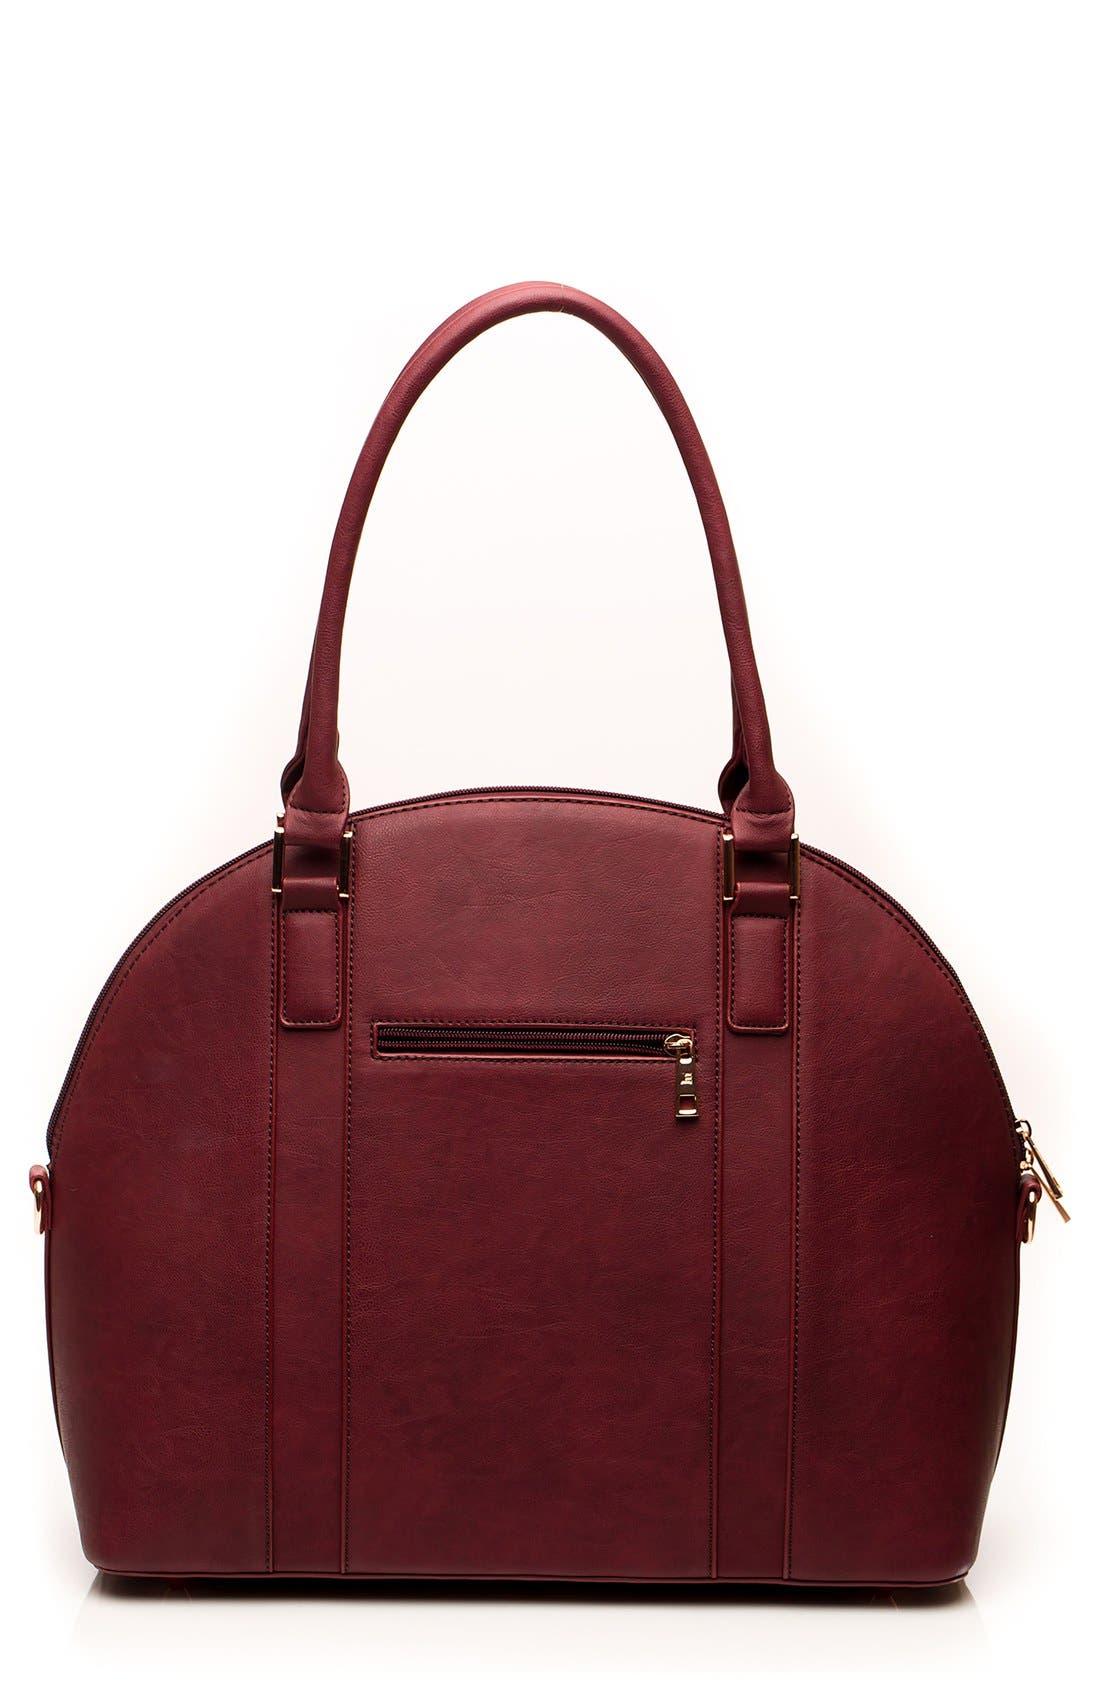 'Rotunda' Diaper Bag,                             Main thumbnail 1, color,                             Pomegranate